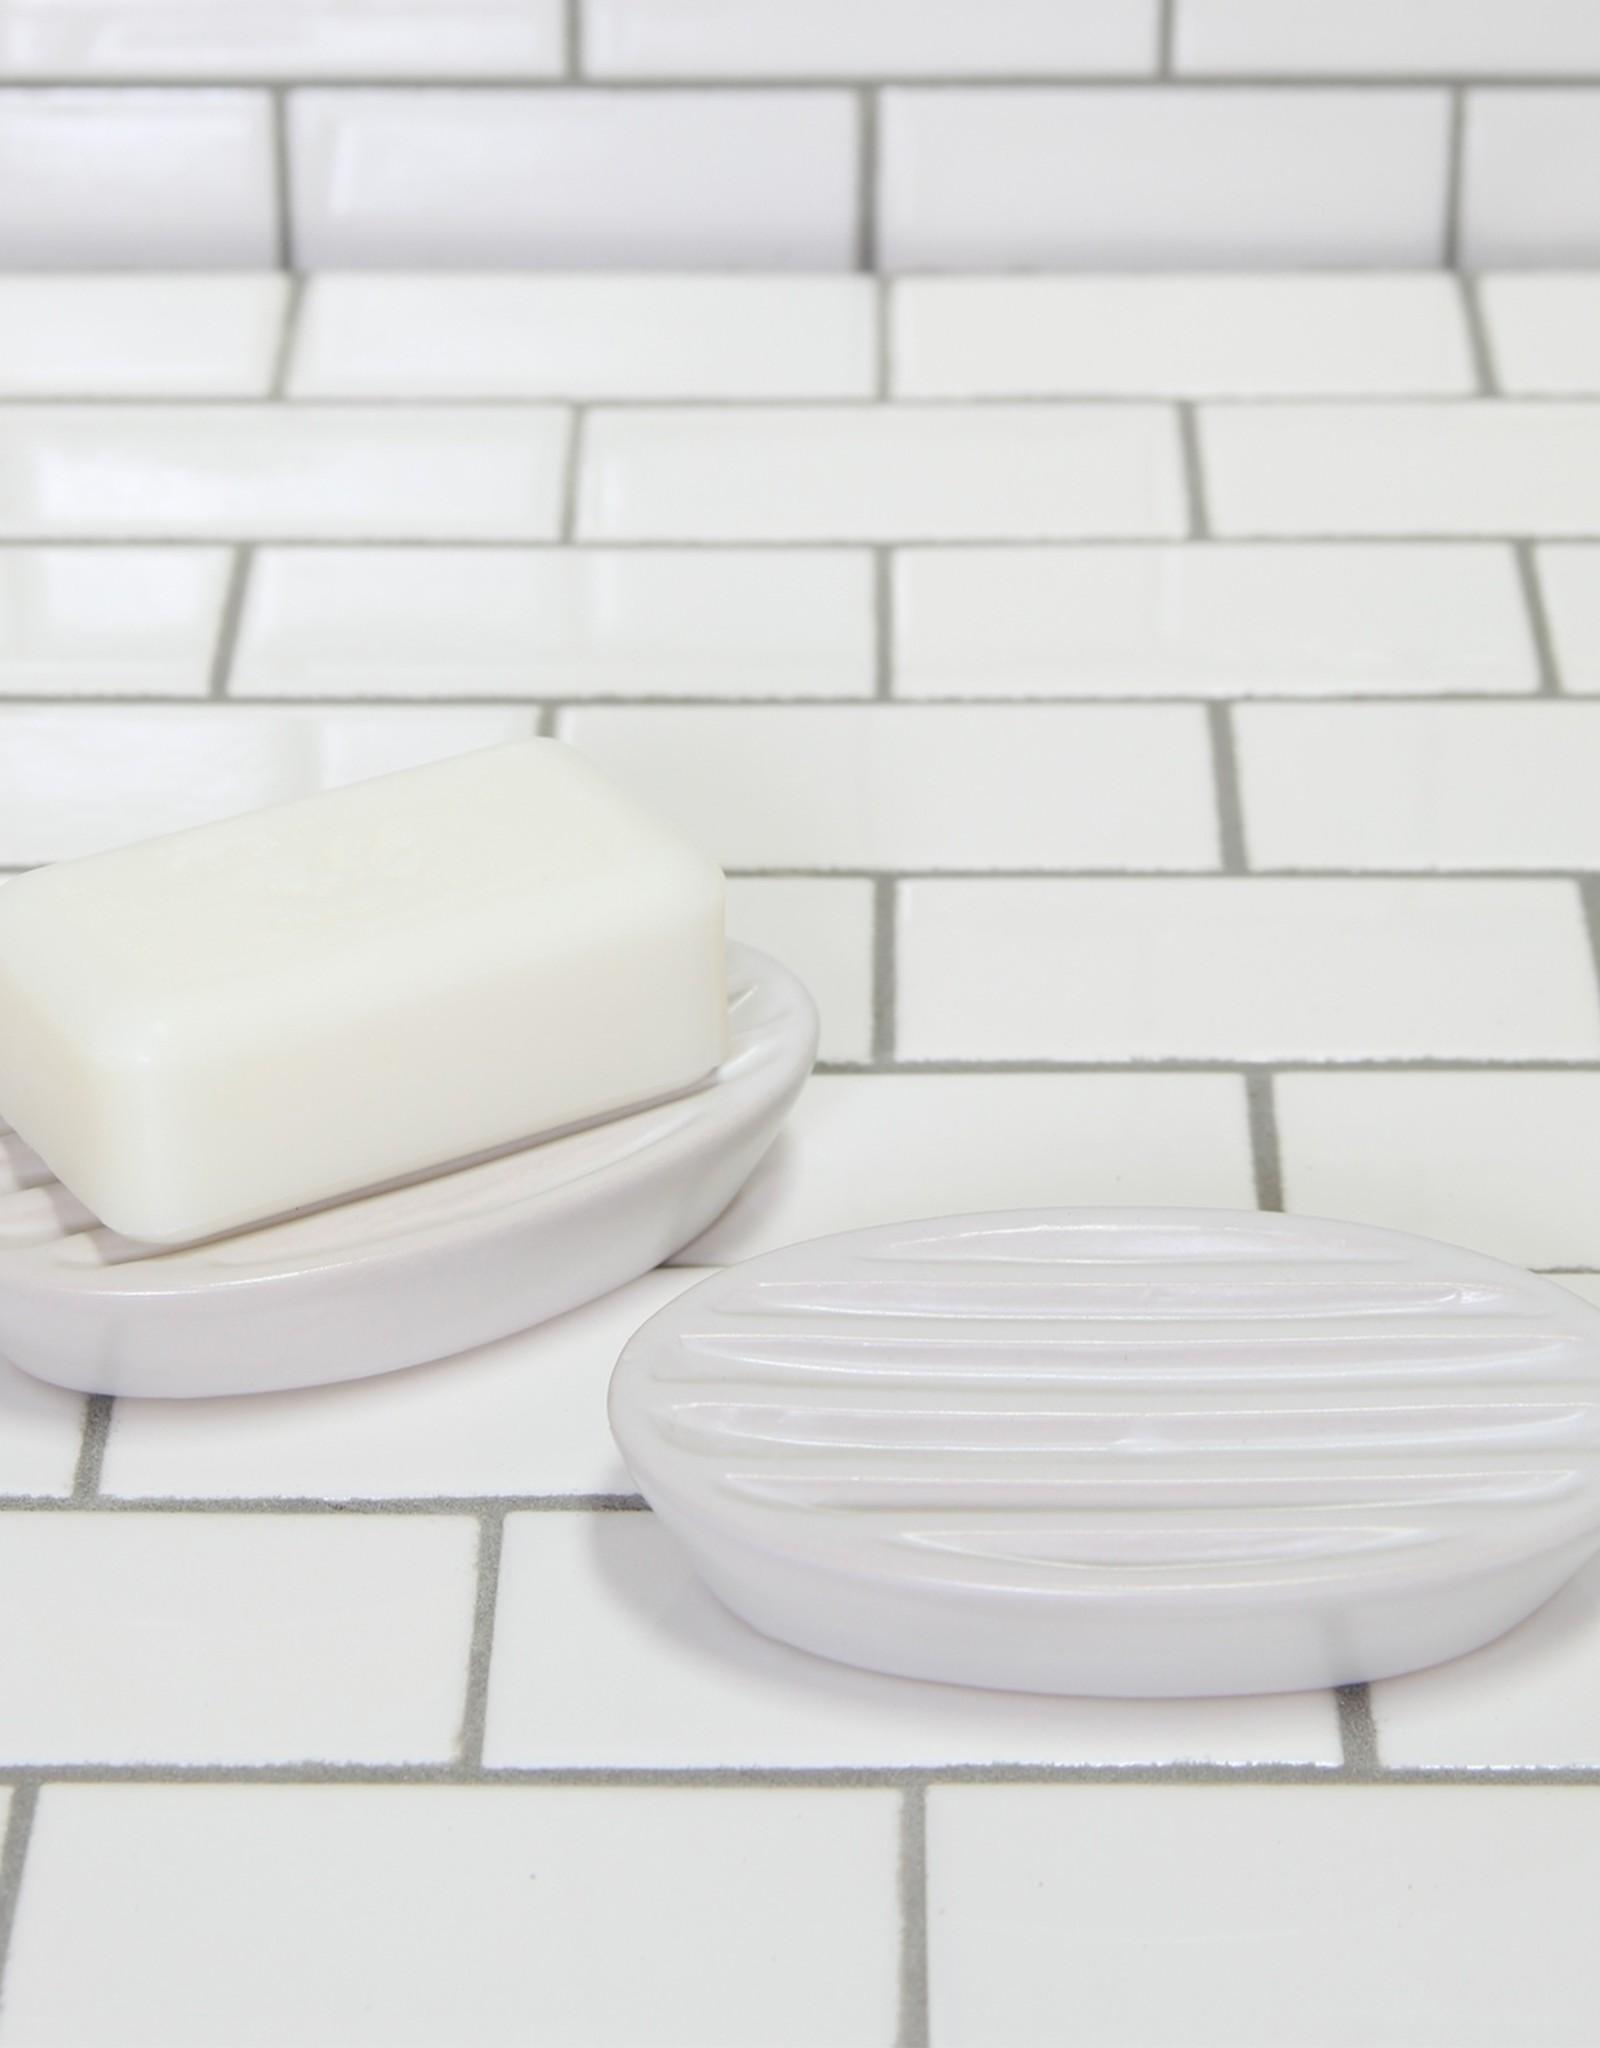 HomArt Soap Dish - Oval white